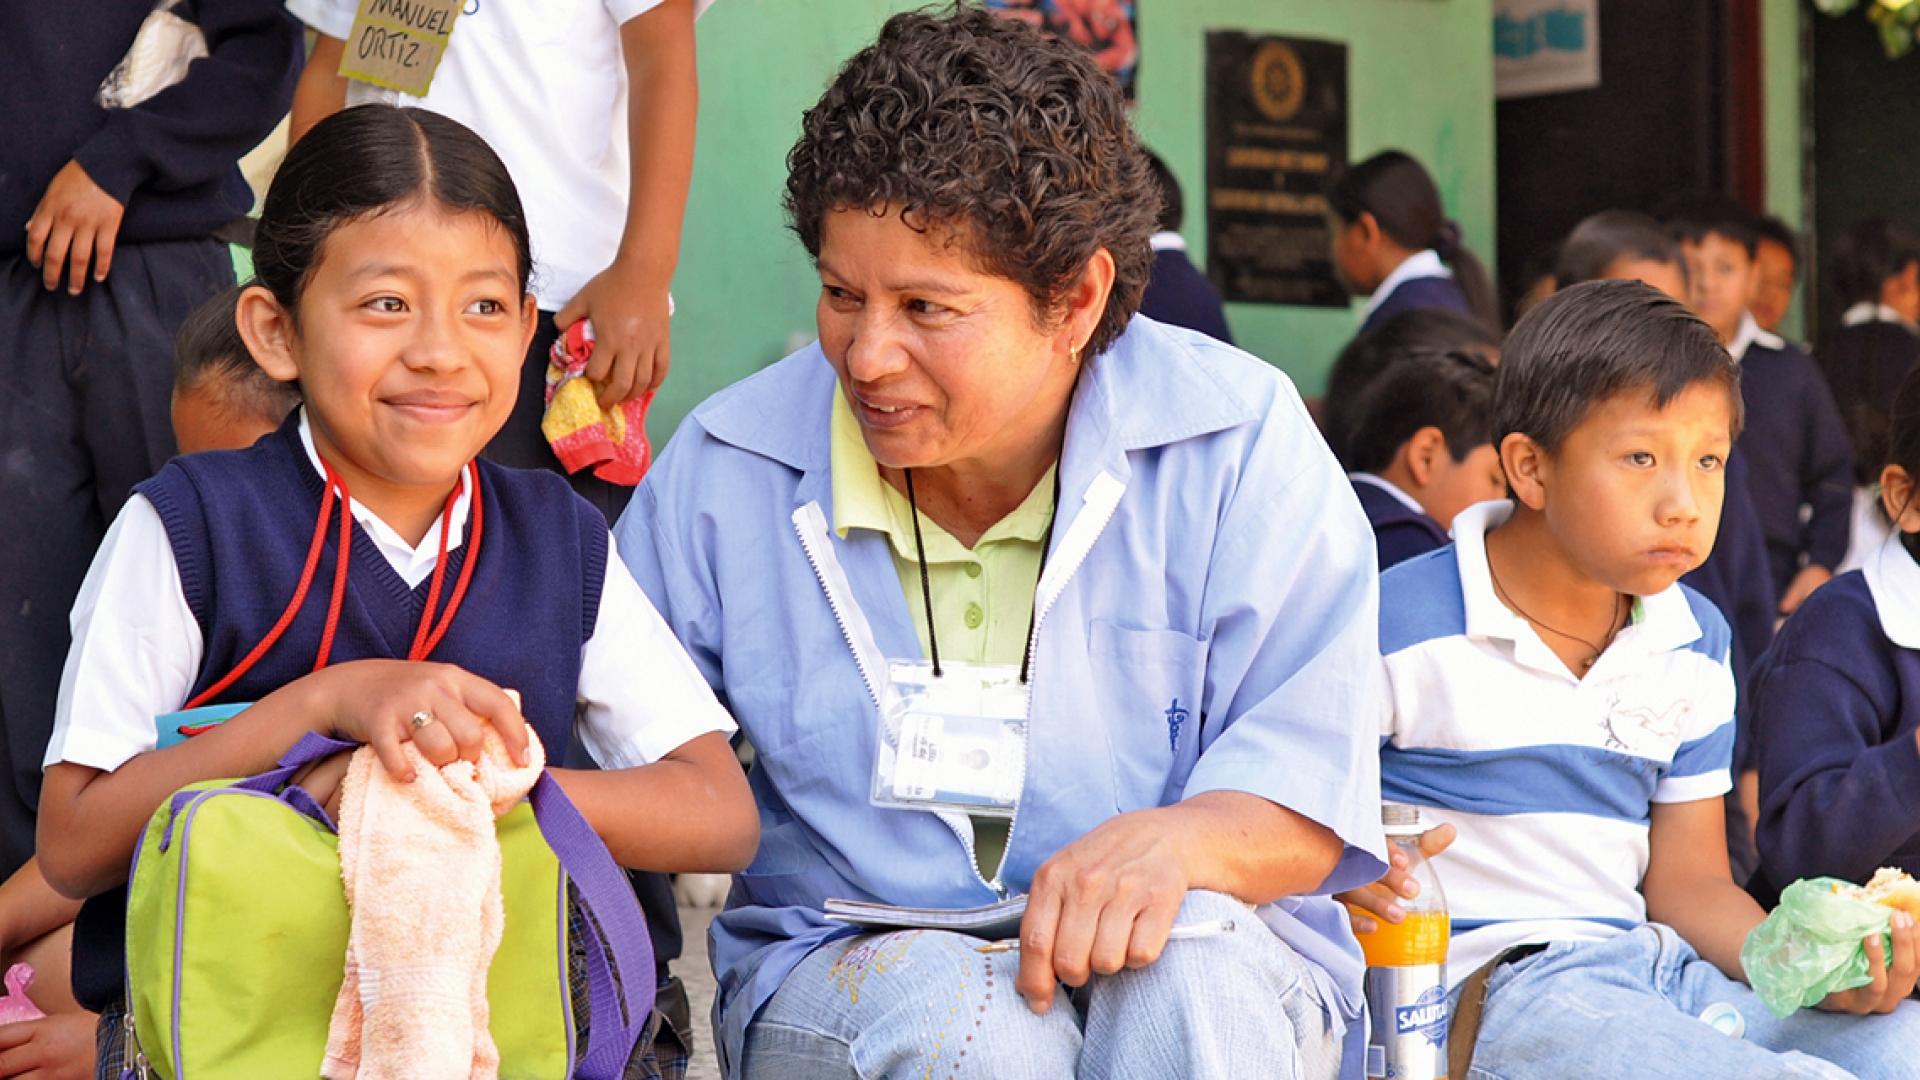 Global Alliance for Improved Nutrition